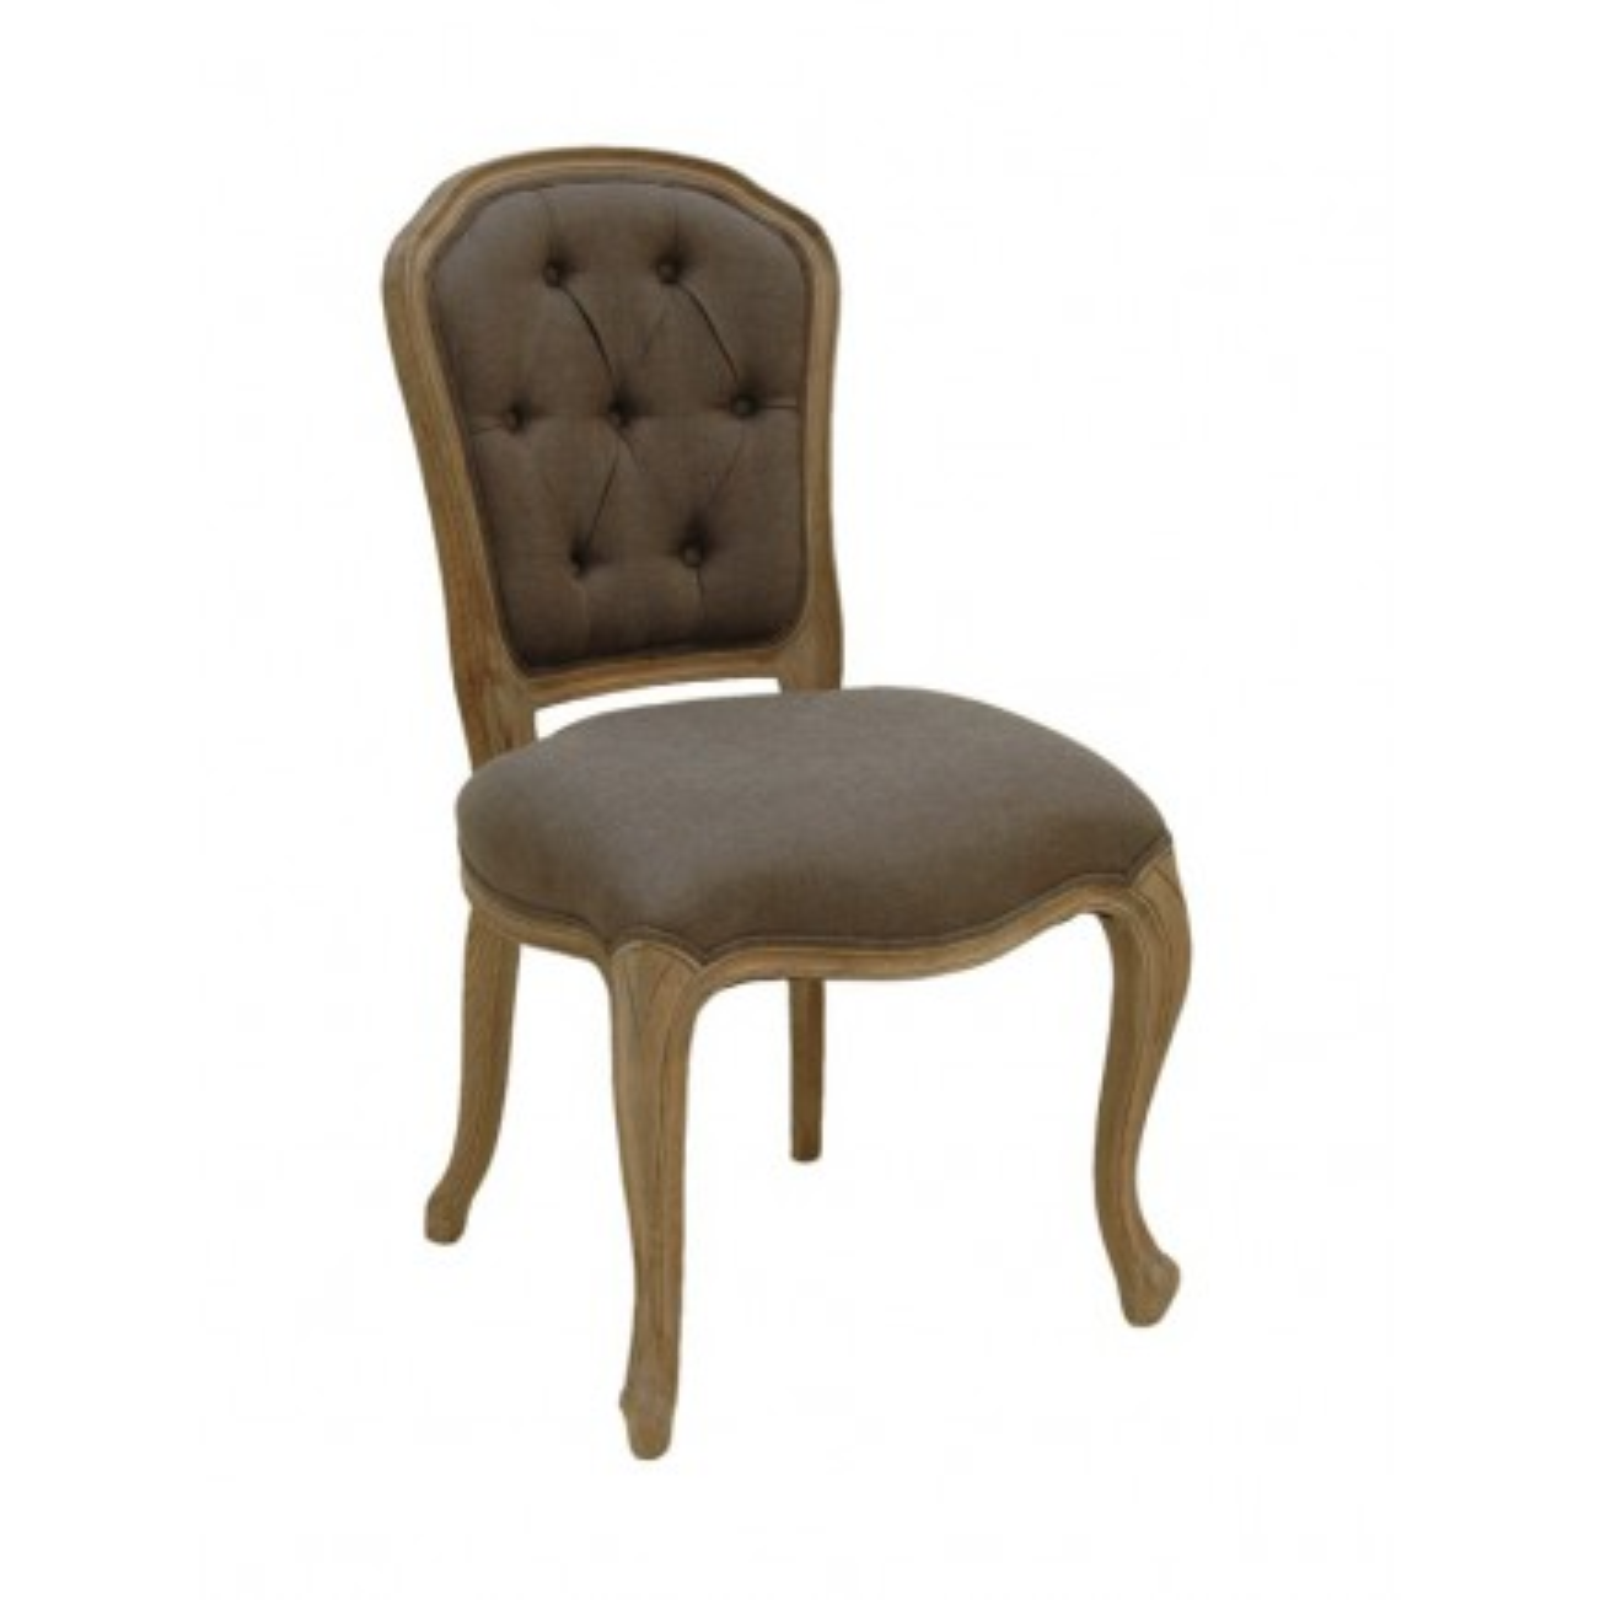 Chaise Louise Chêne - meuble bois massif